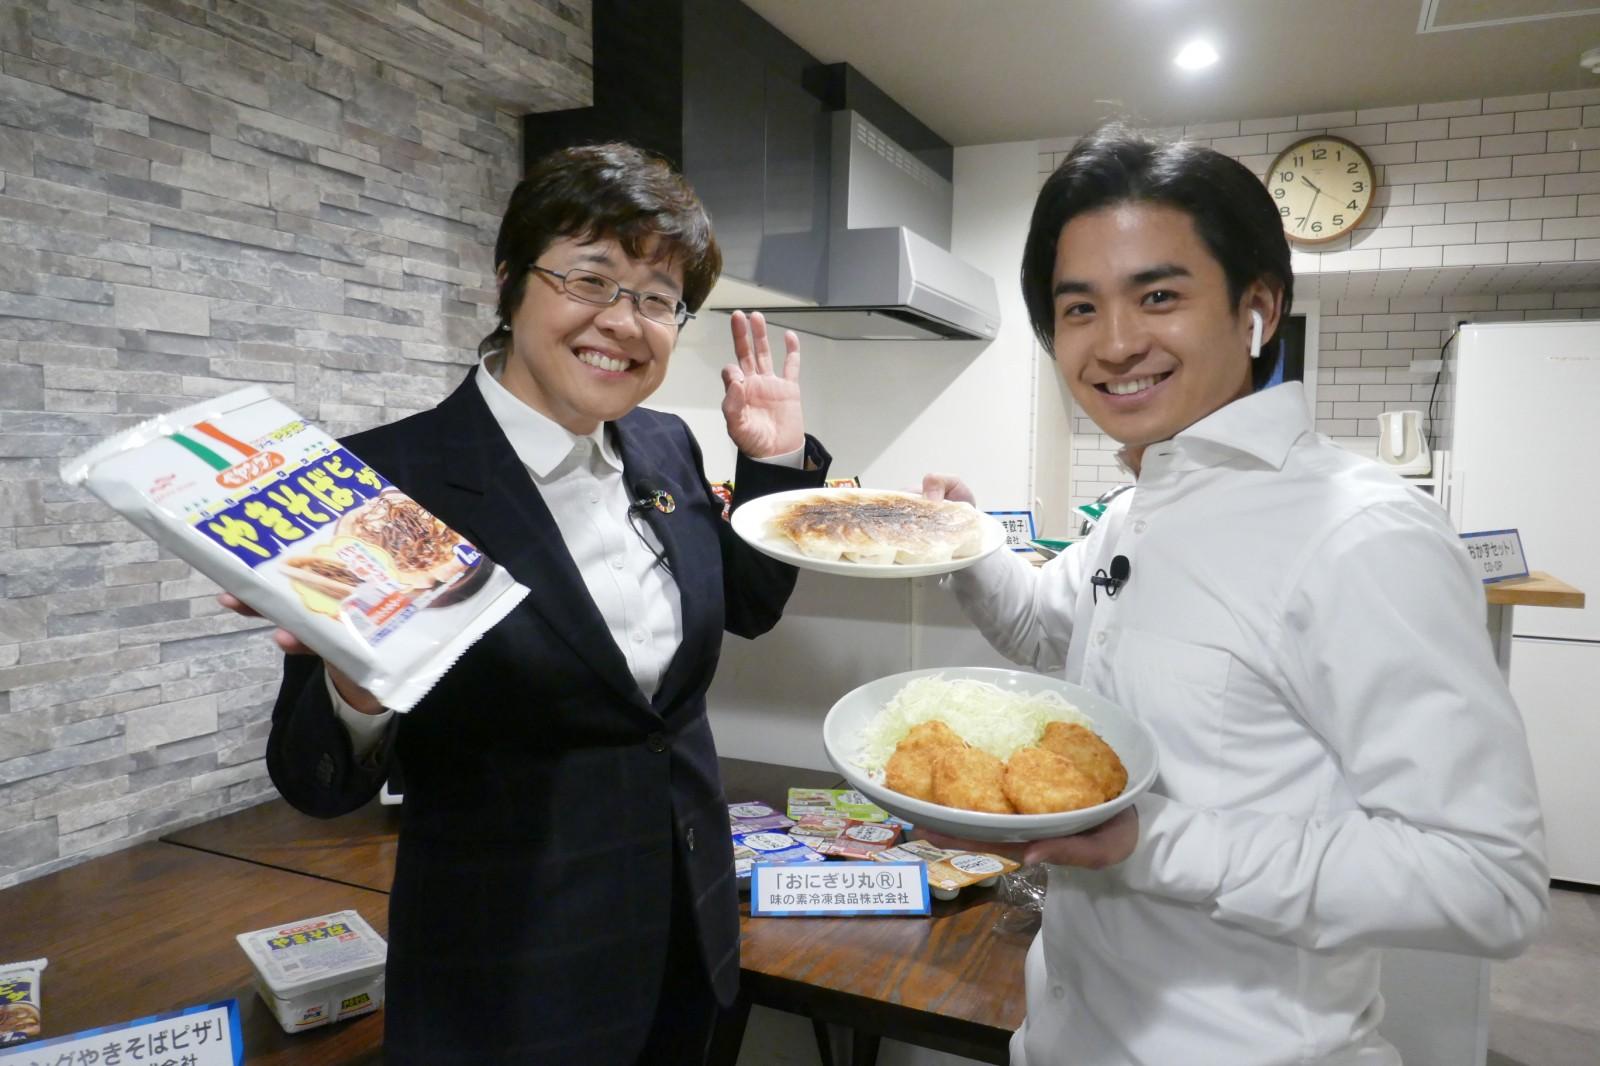 AbemaTV「Abema Prime」のトレンド生中継(3/12)で冷凍食品ご紹介